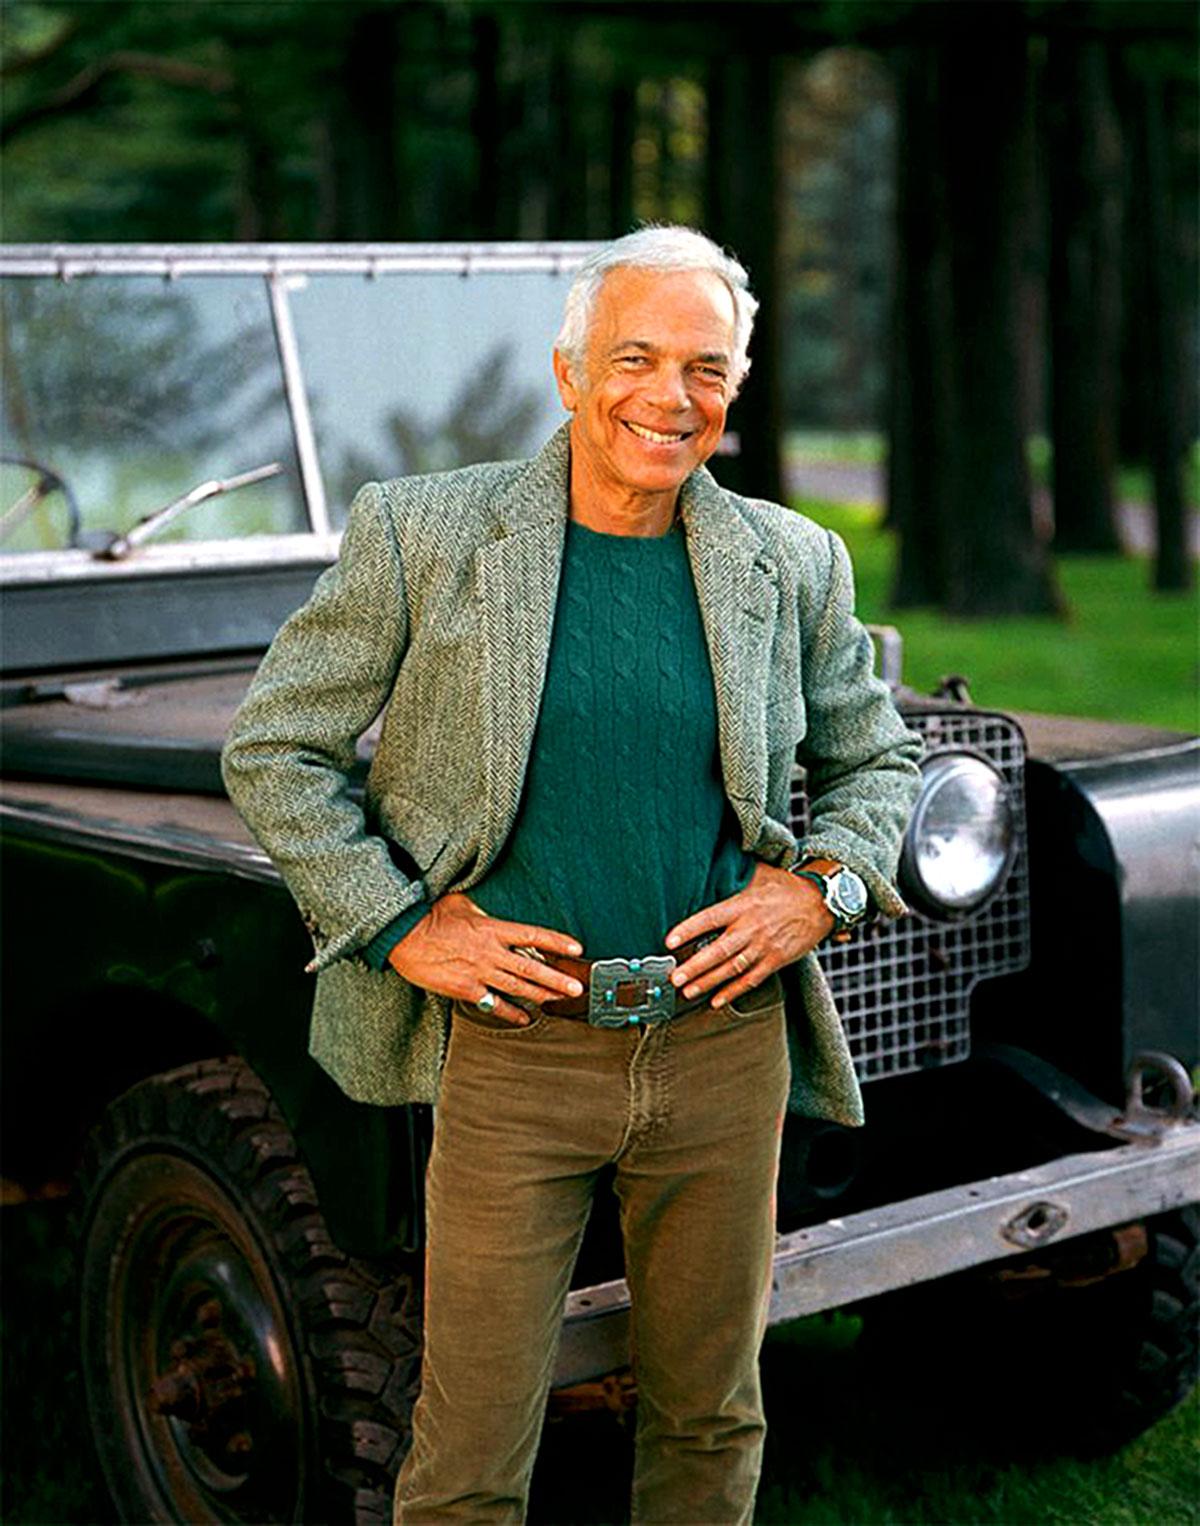 Ralph Lauren Inspired Gold Striped Pillow: ...Welcome To PaneraiMagazine.com Home Of Jake's Panerai